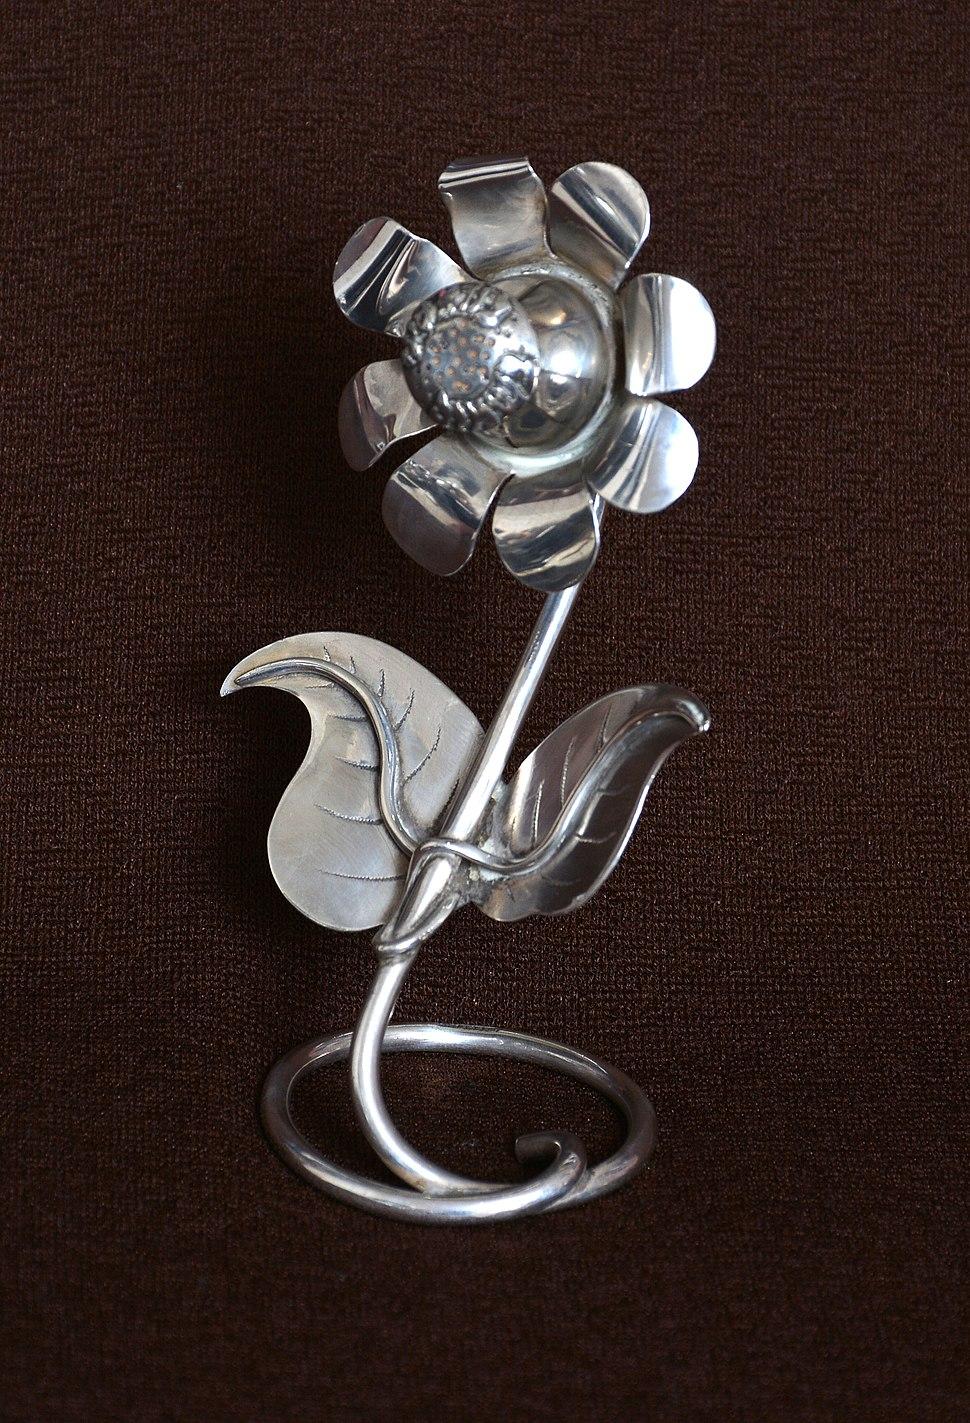 Flower-shaped Havdalah spice box designed by Rabbi Chaim-Joseph-Meyer Elefant (1897-1976) in the early 1950s